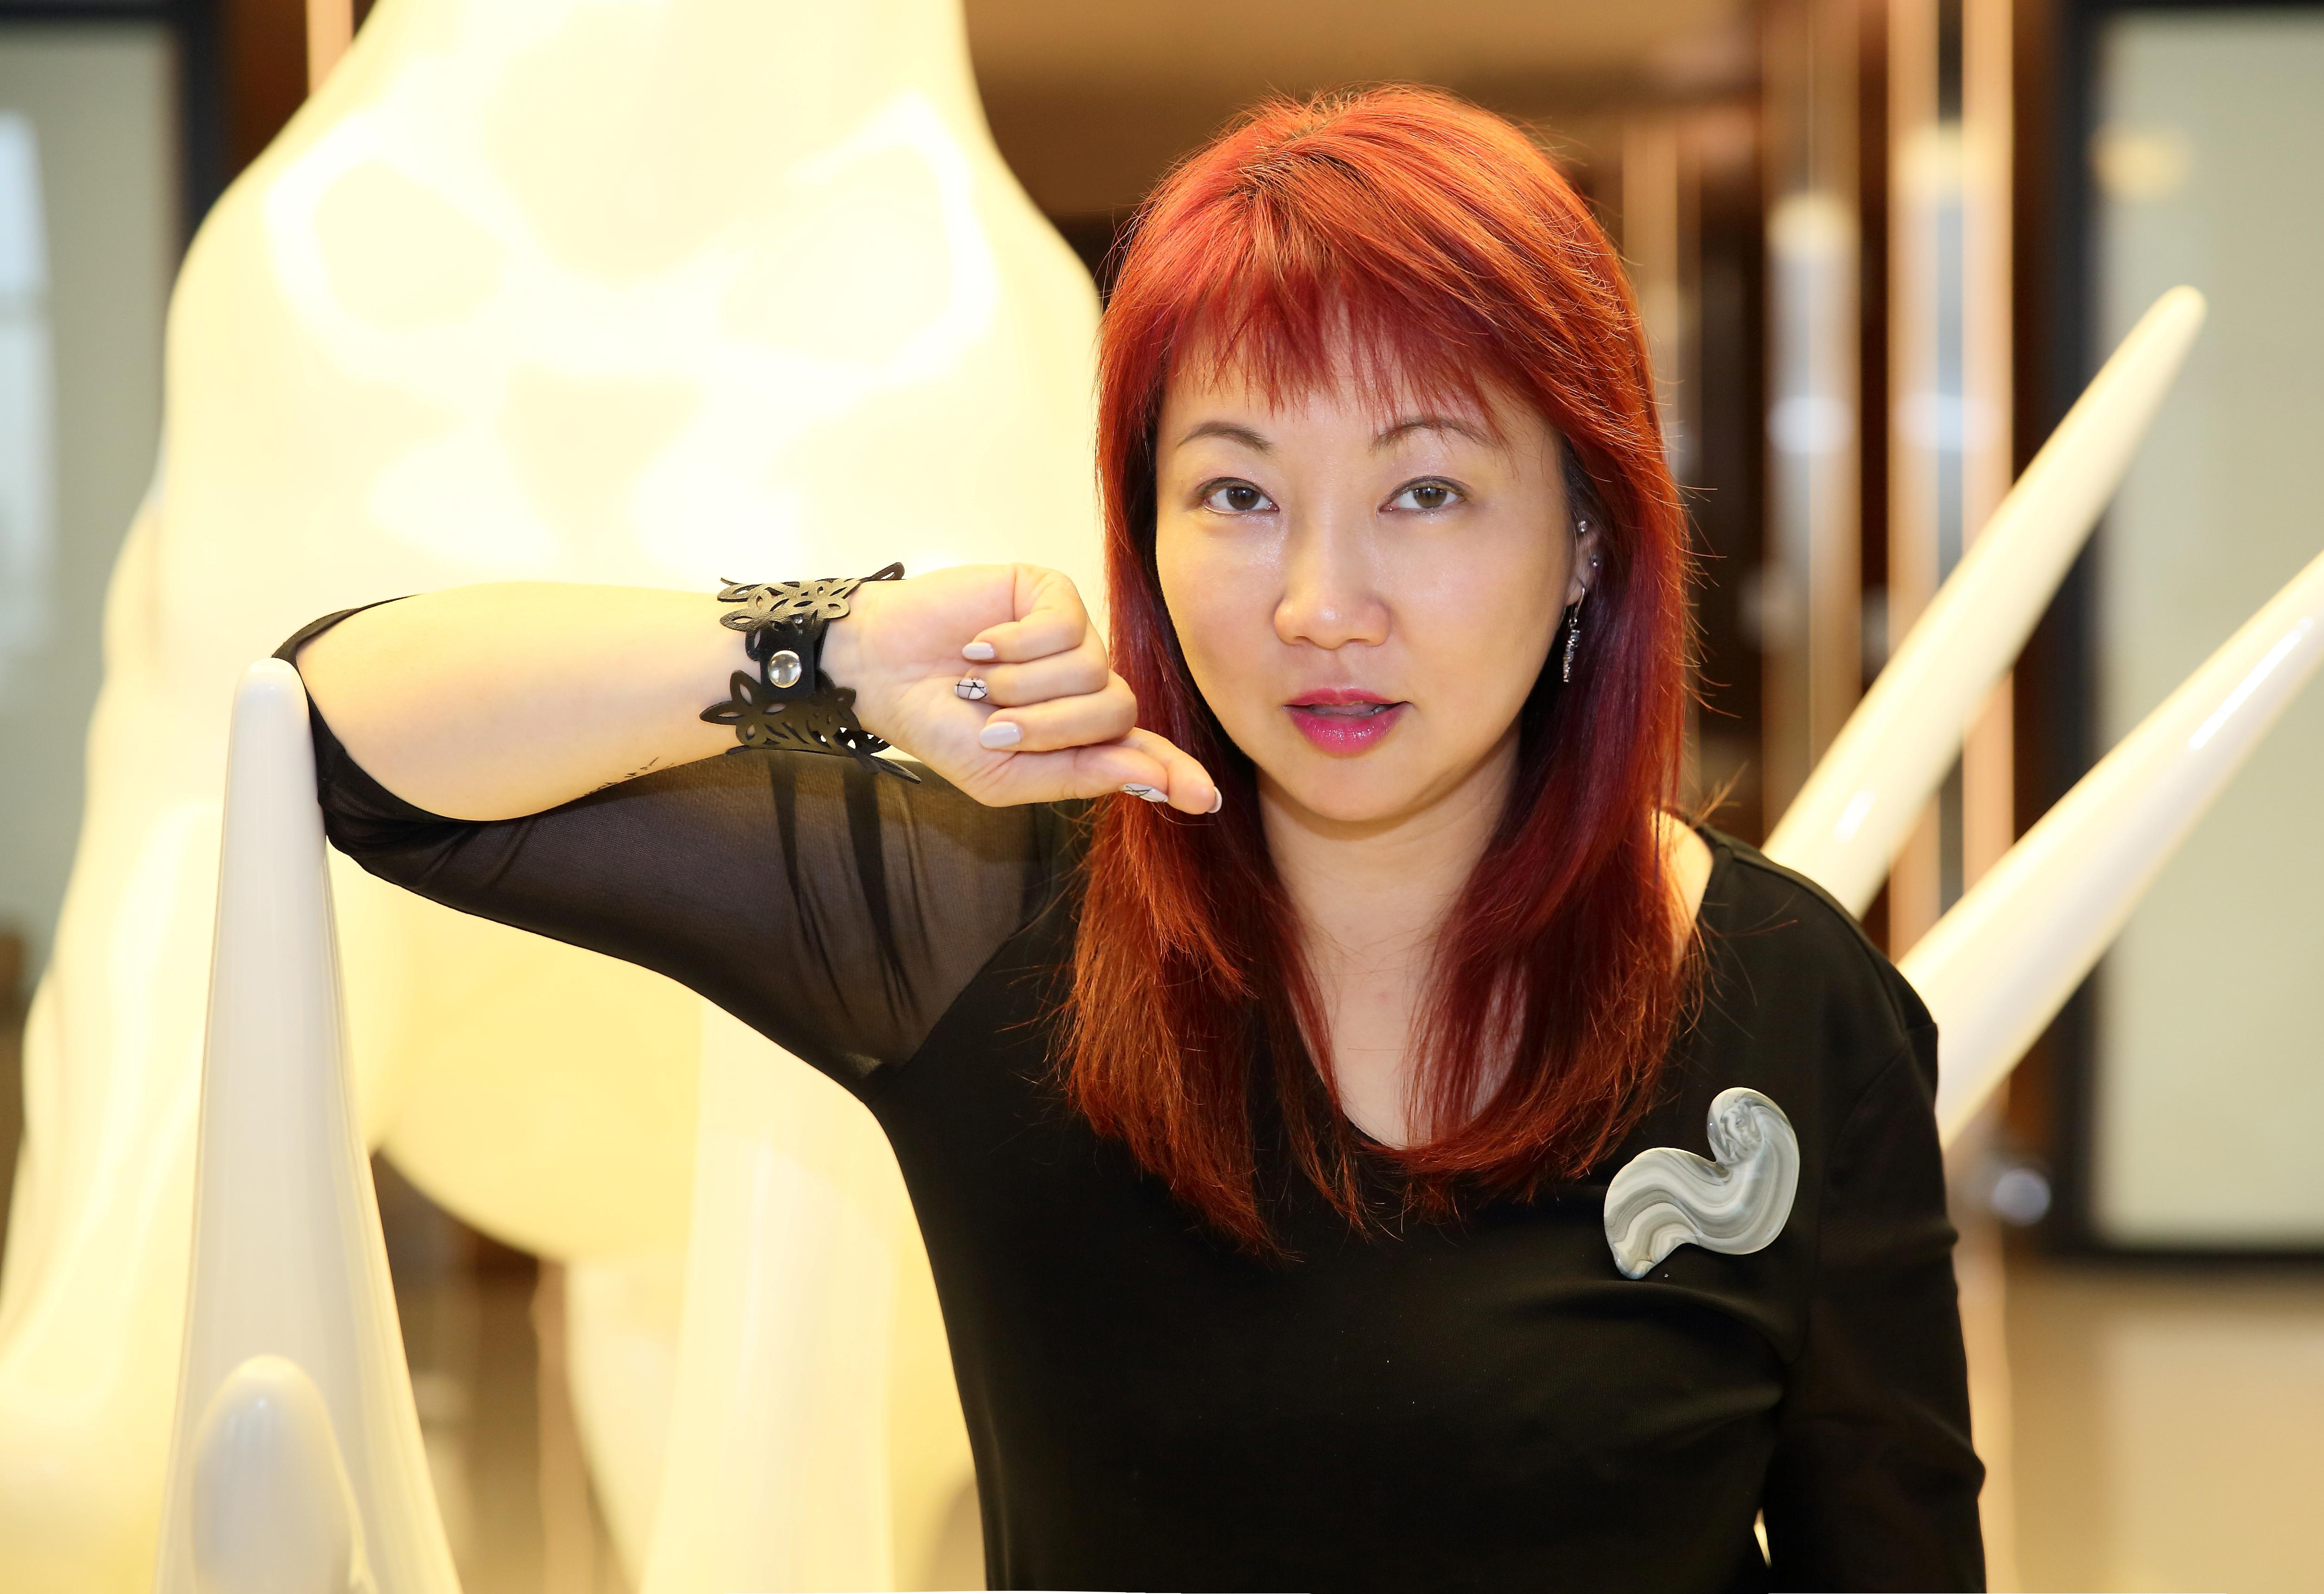 Eurince Wong